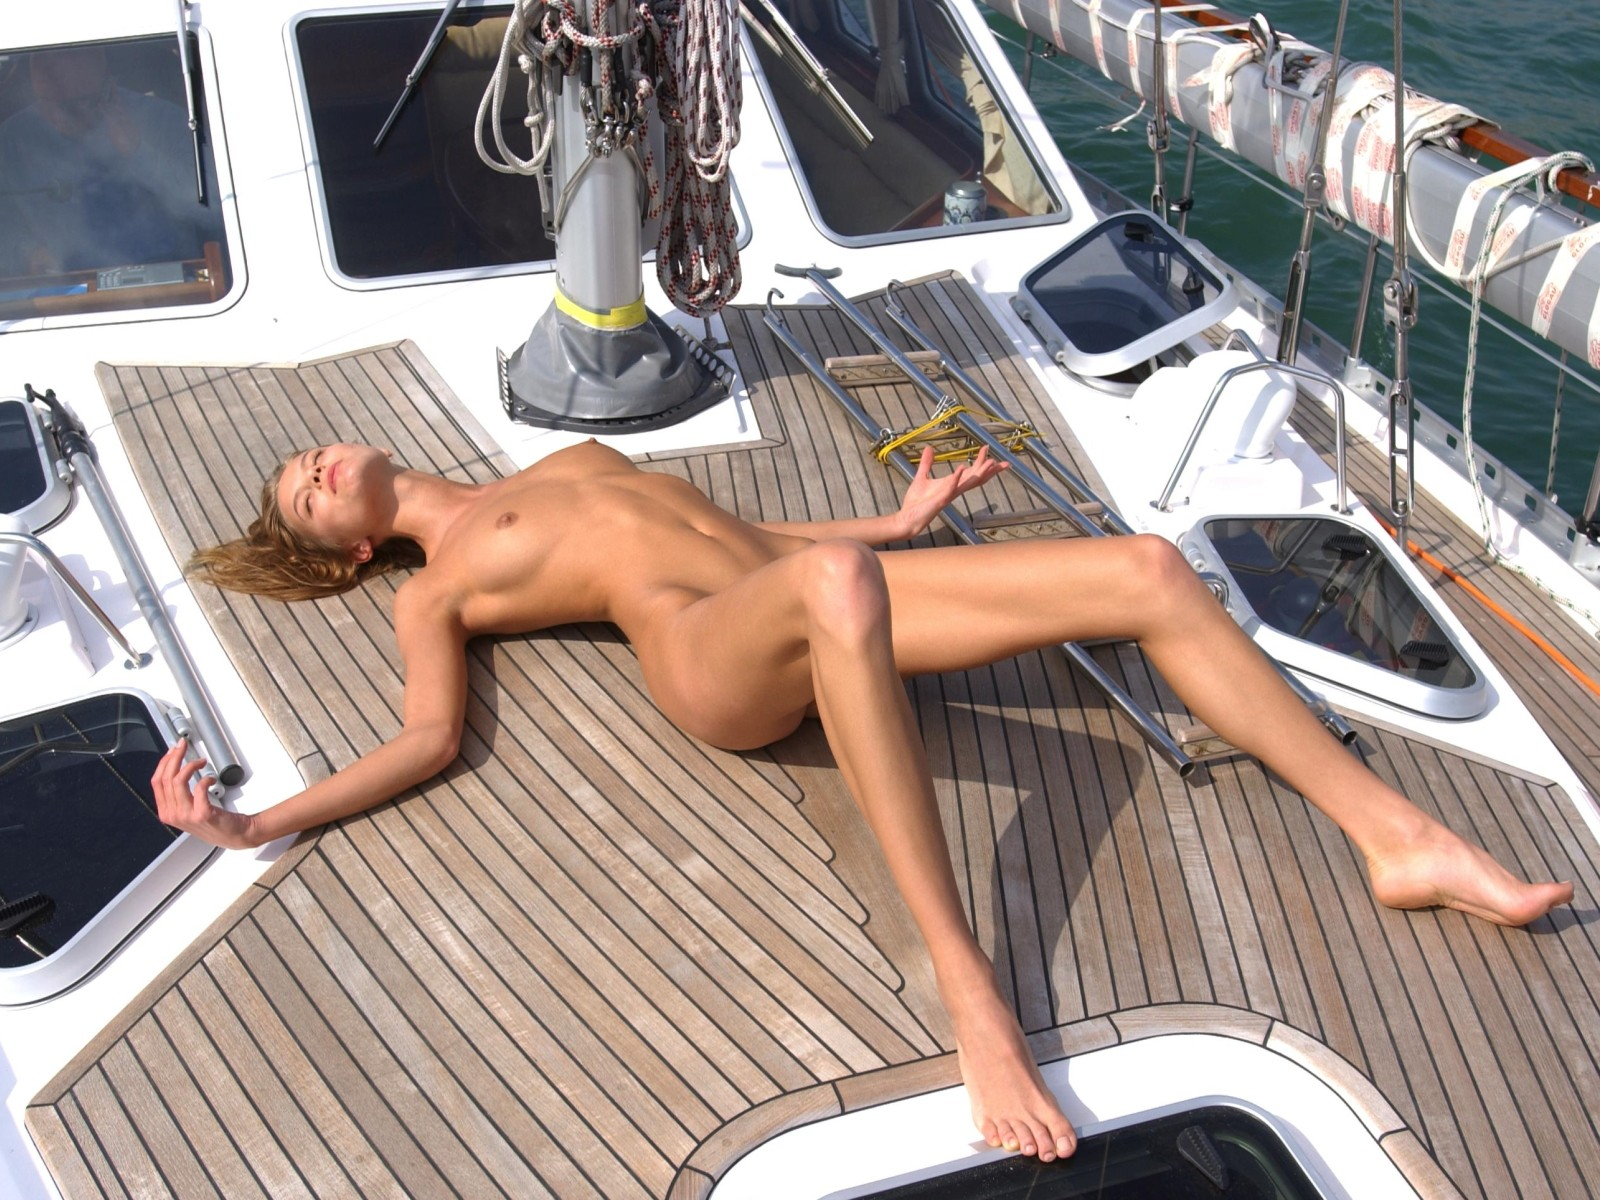 free-porn-naked-tan-girl-on-boat-bing